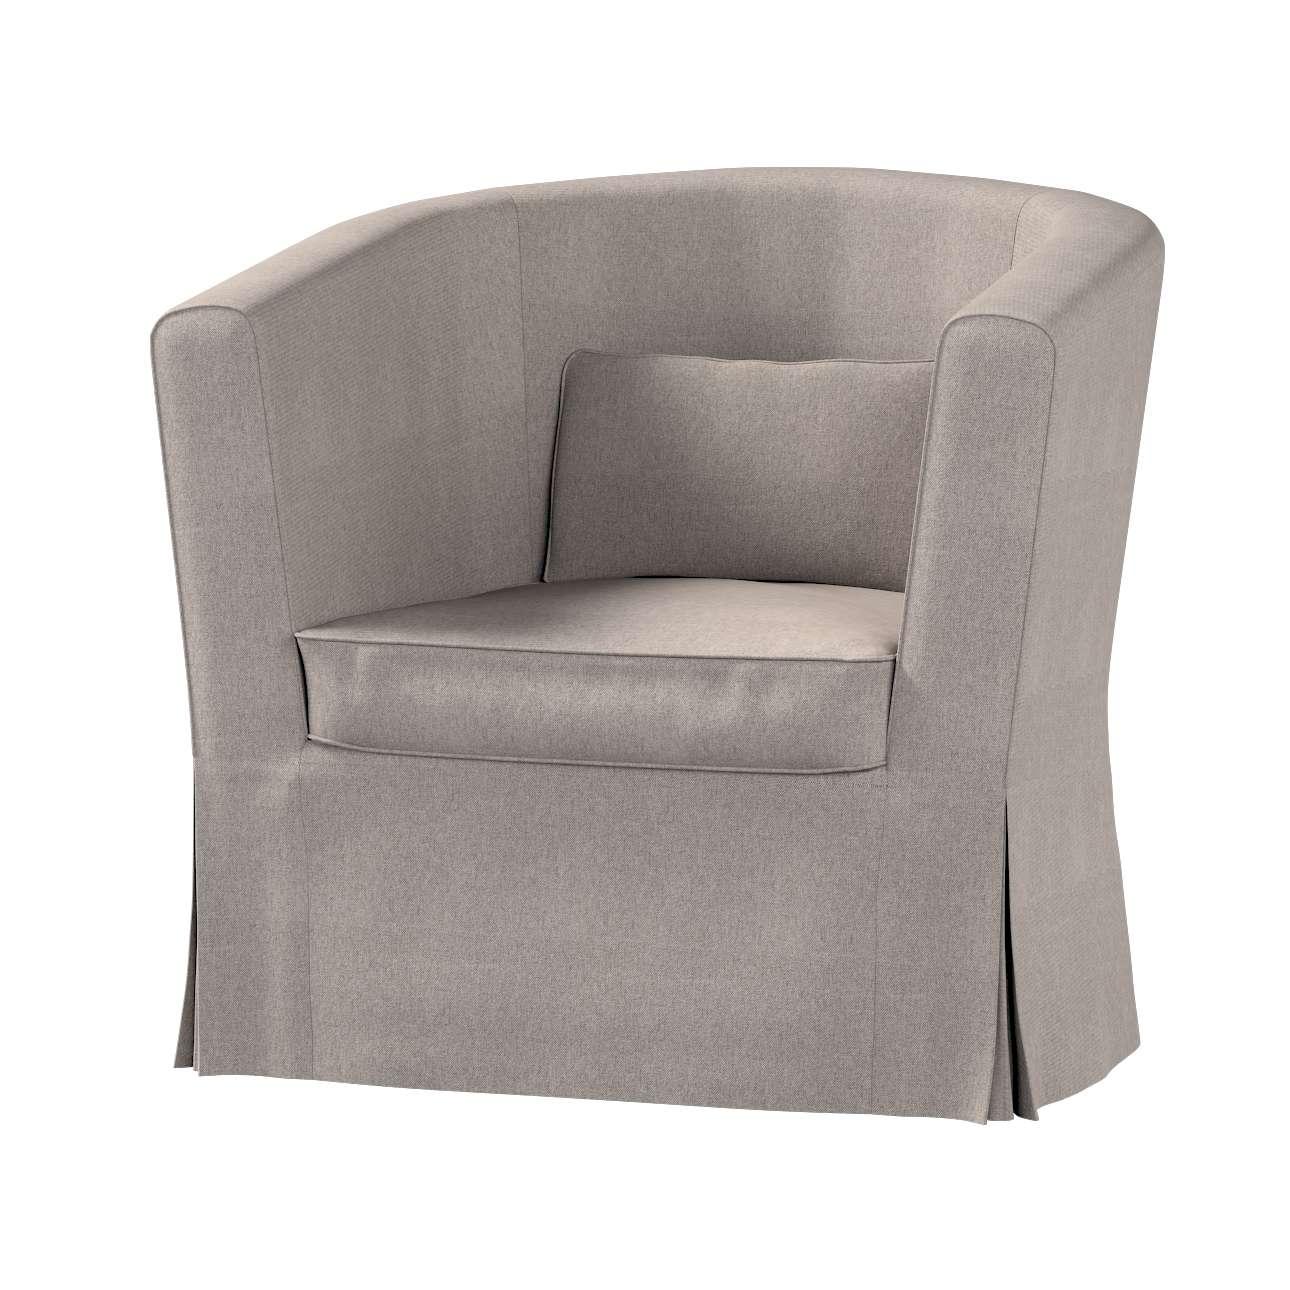 Ektorp Tullsta Sesselbezug Sesselhusse, Ektorp Tullsta von der Kollektion Etna, Stoff: 705-09